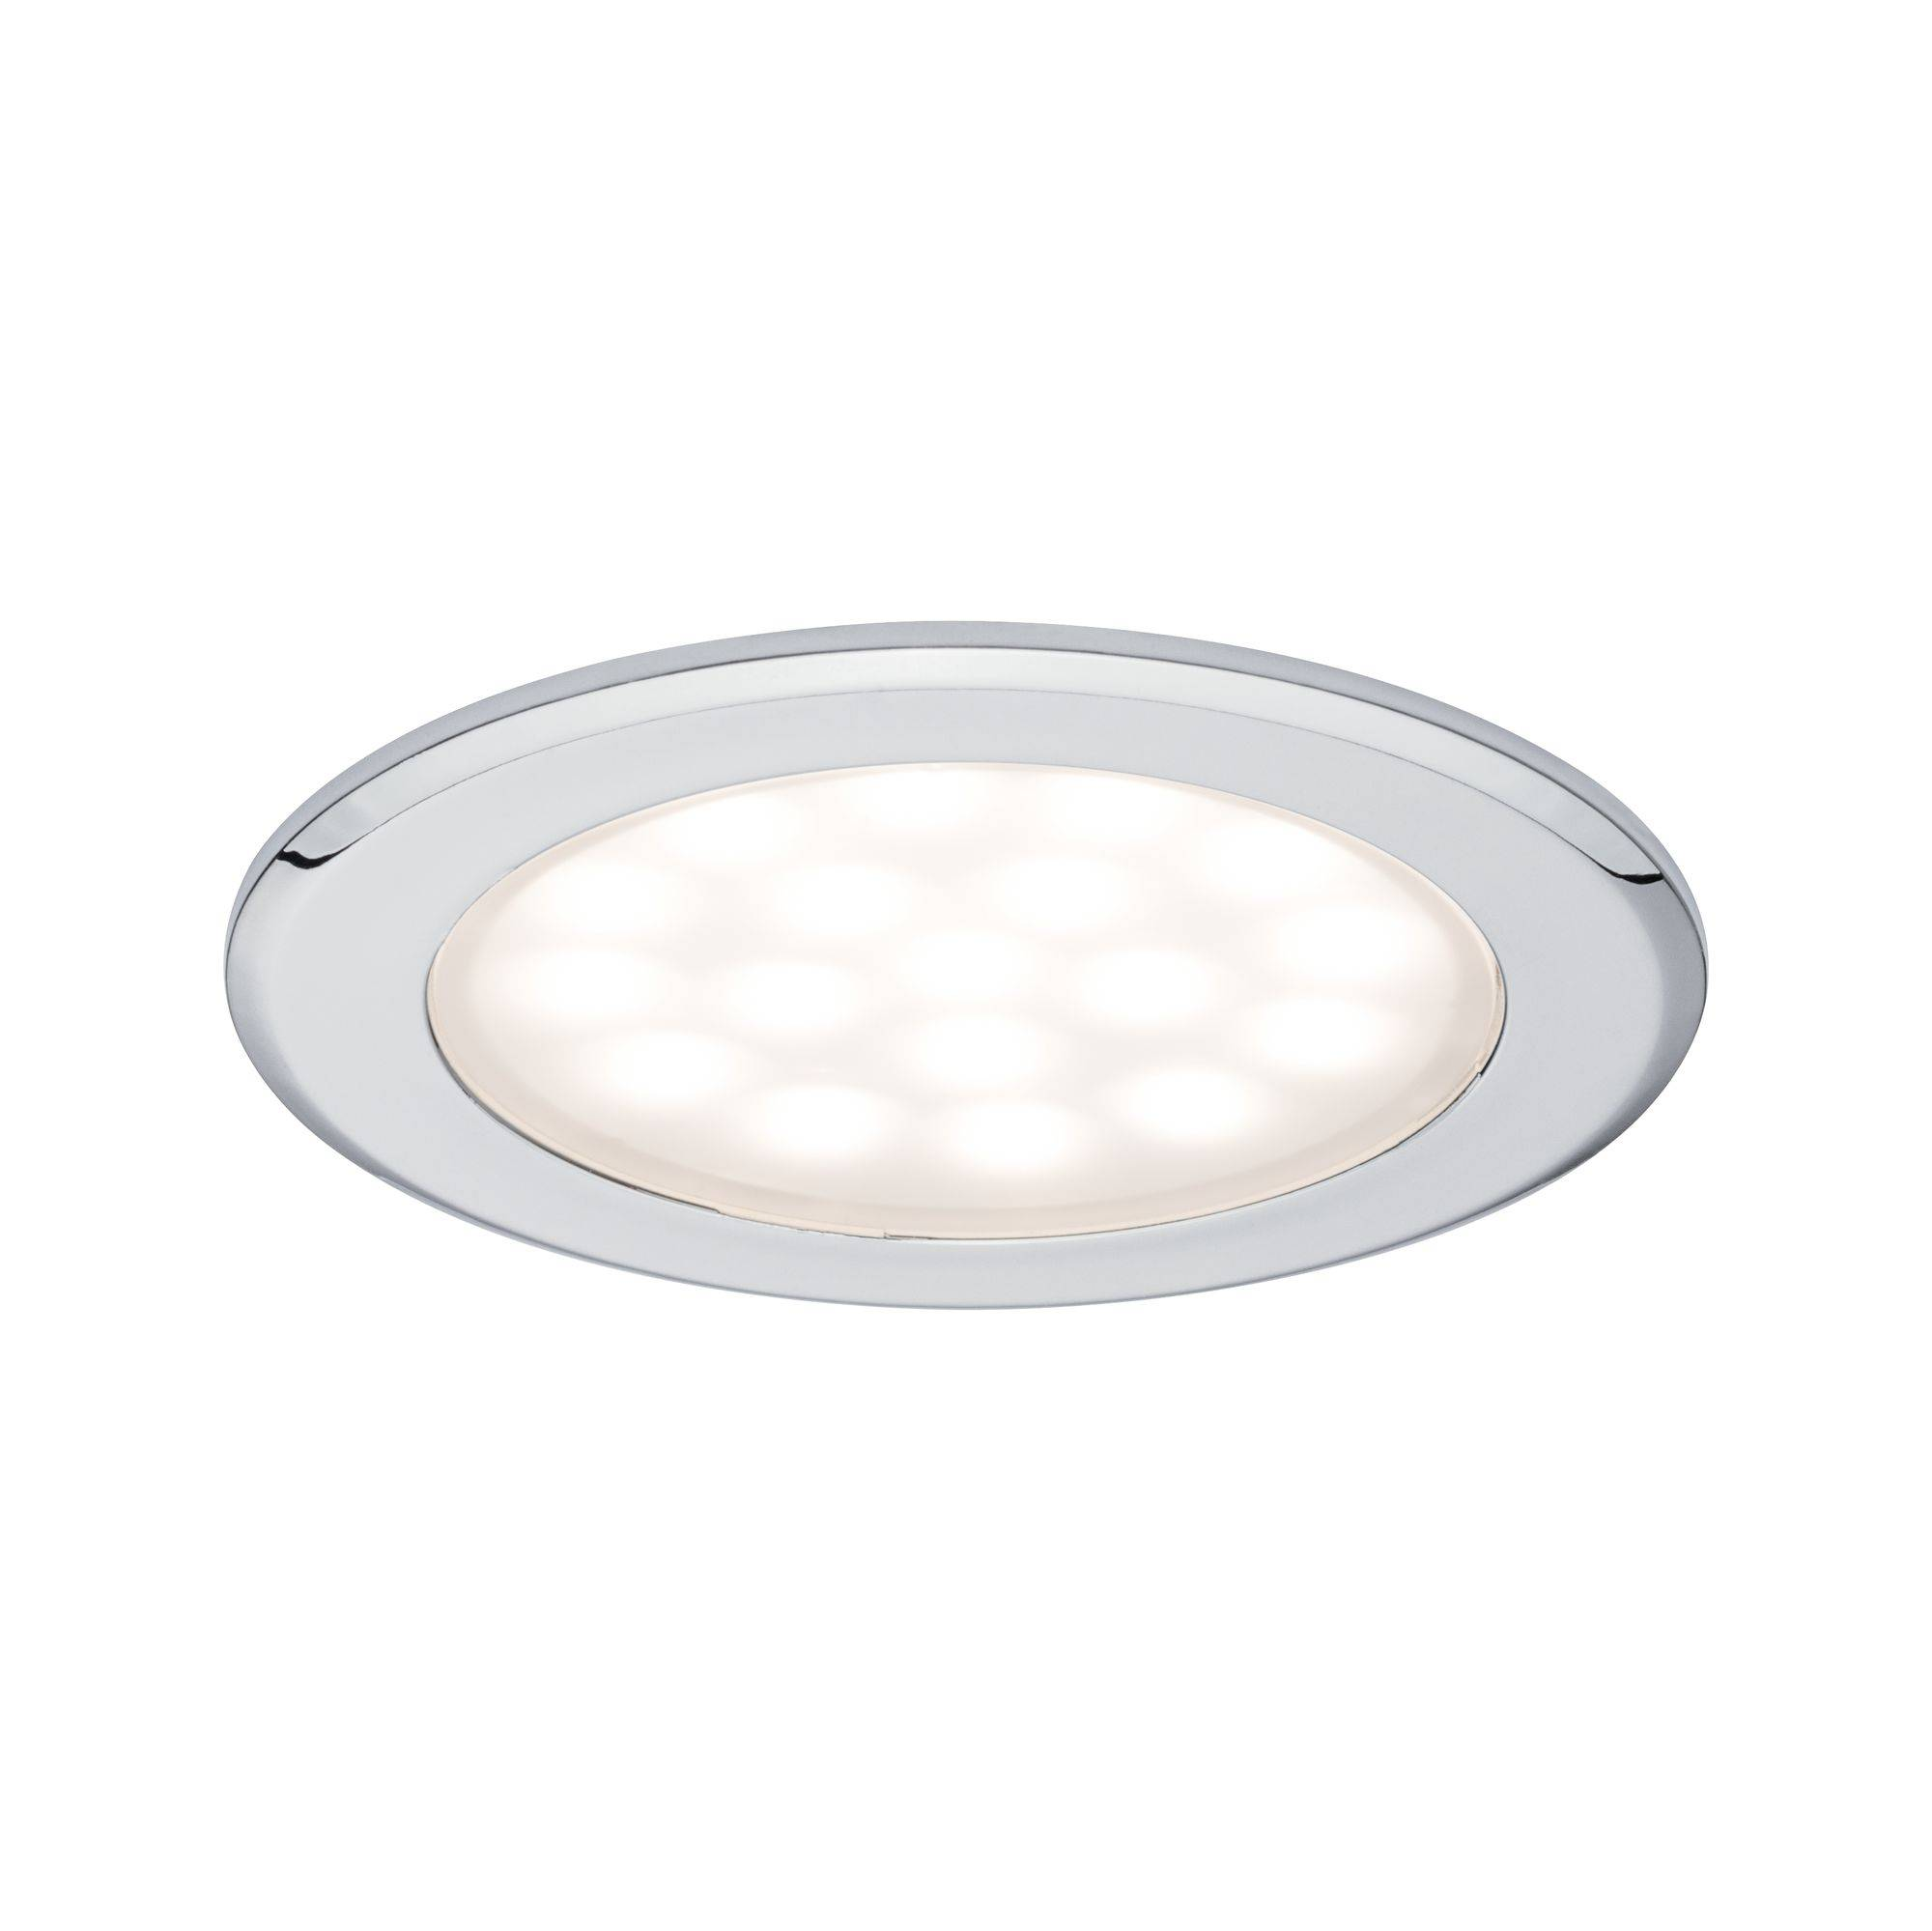 Details zu LED Boden Leuchten Strahler 3er Set IP64 Wand Boden Terrassen Lampe KALT WEISS